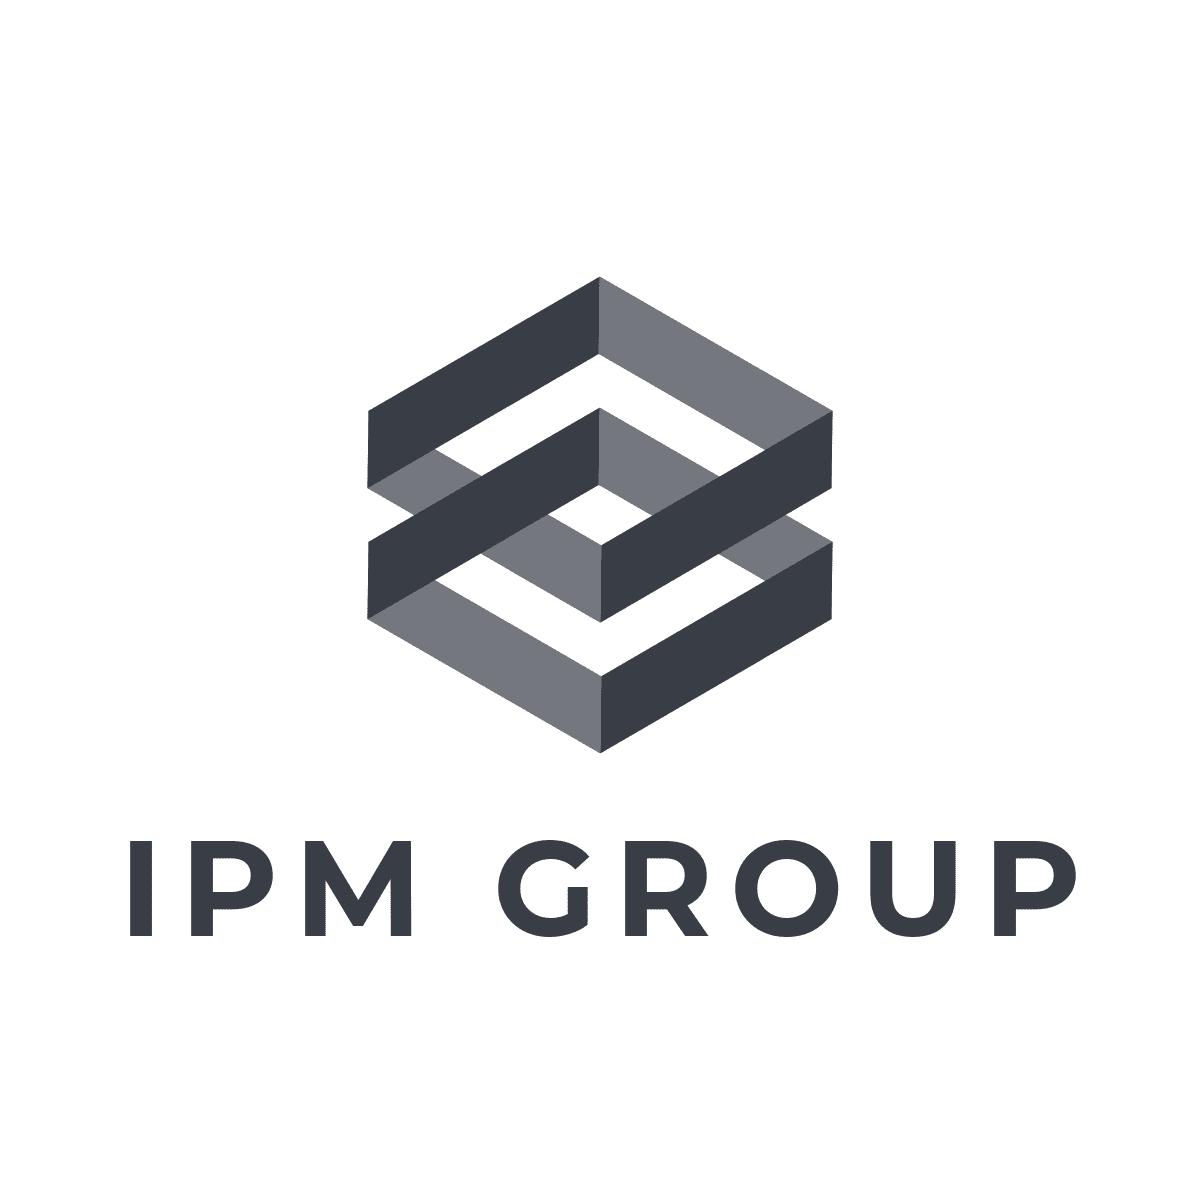 Разработка логотипа для управляющей компании фото f_5785f8307800adb9.png